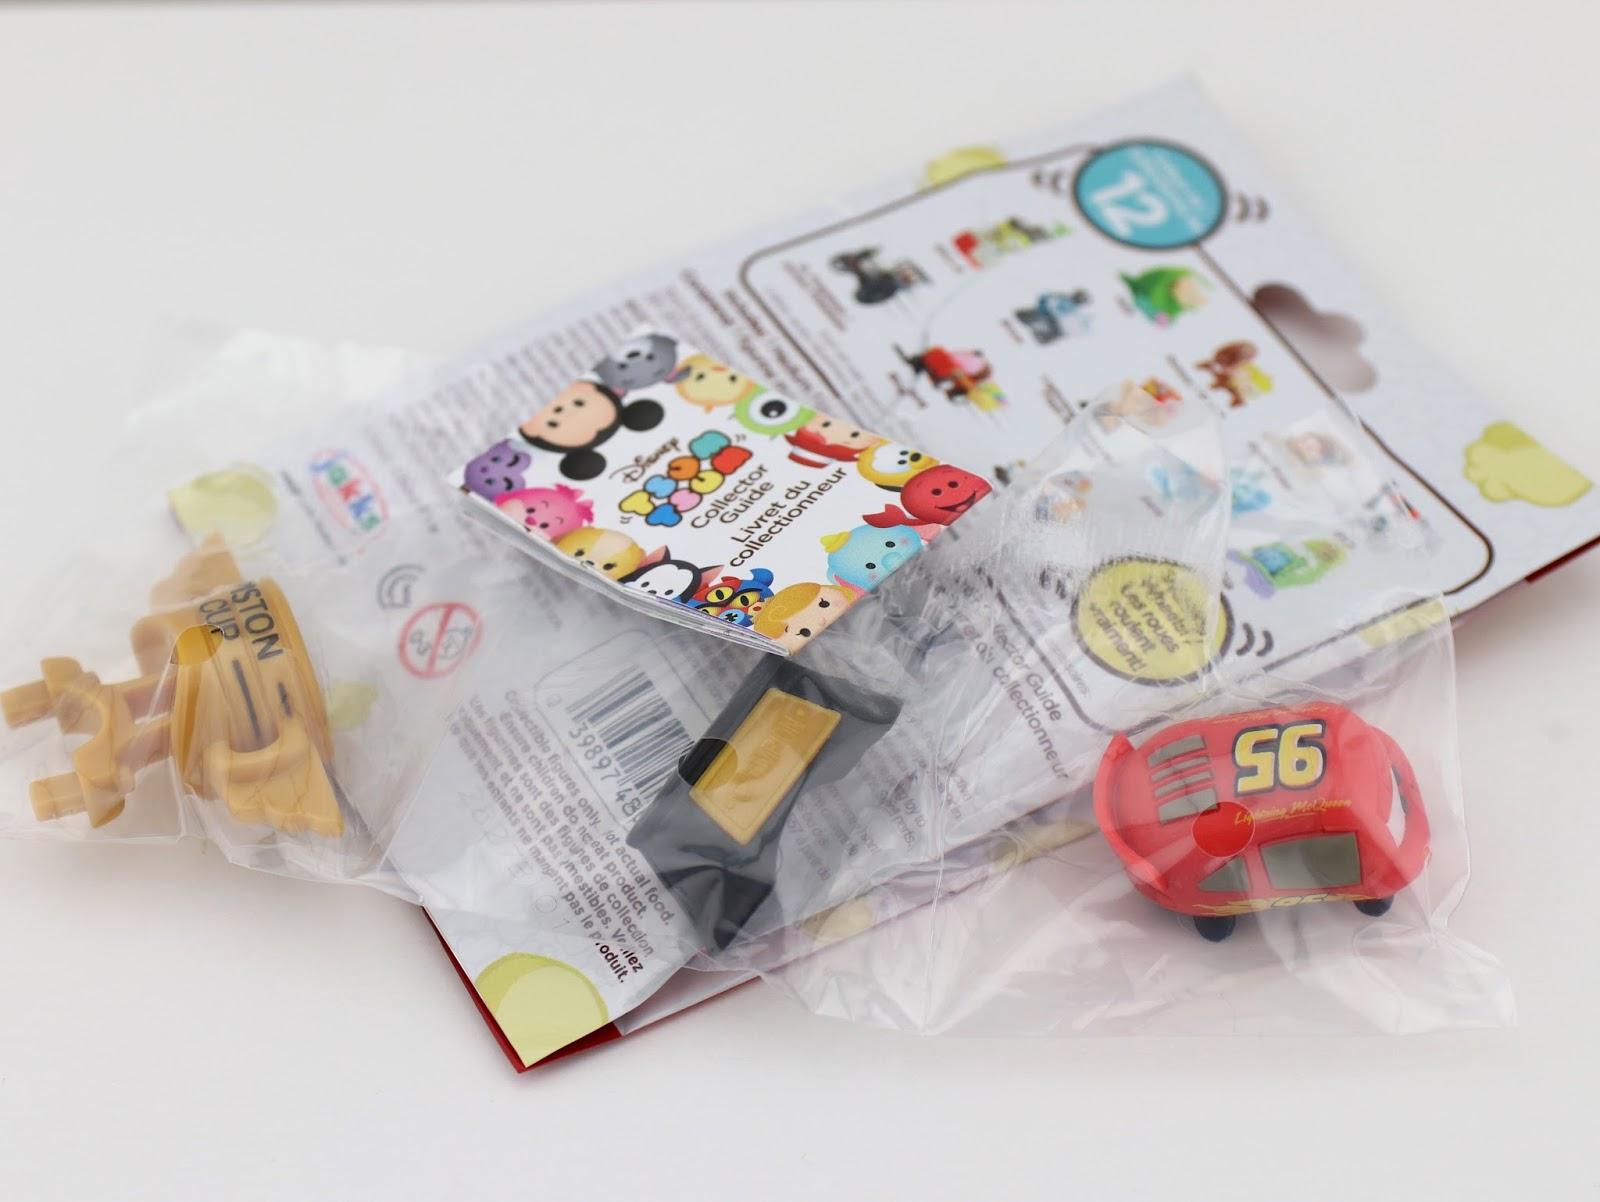 Disney Tsum Tsum Mystery Packs by Jakks Pacific Series 9 Pixar mcqueen